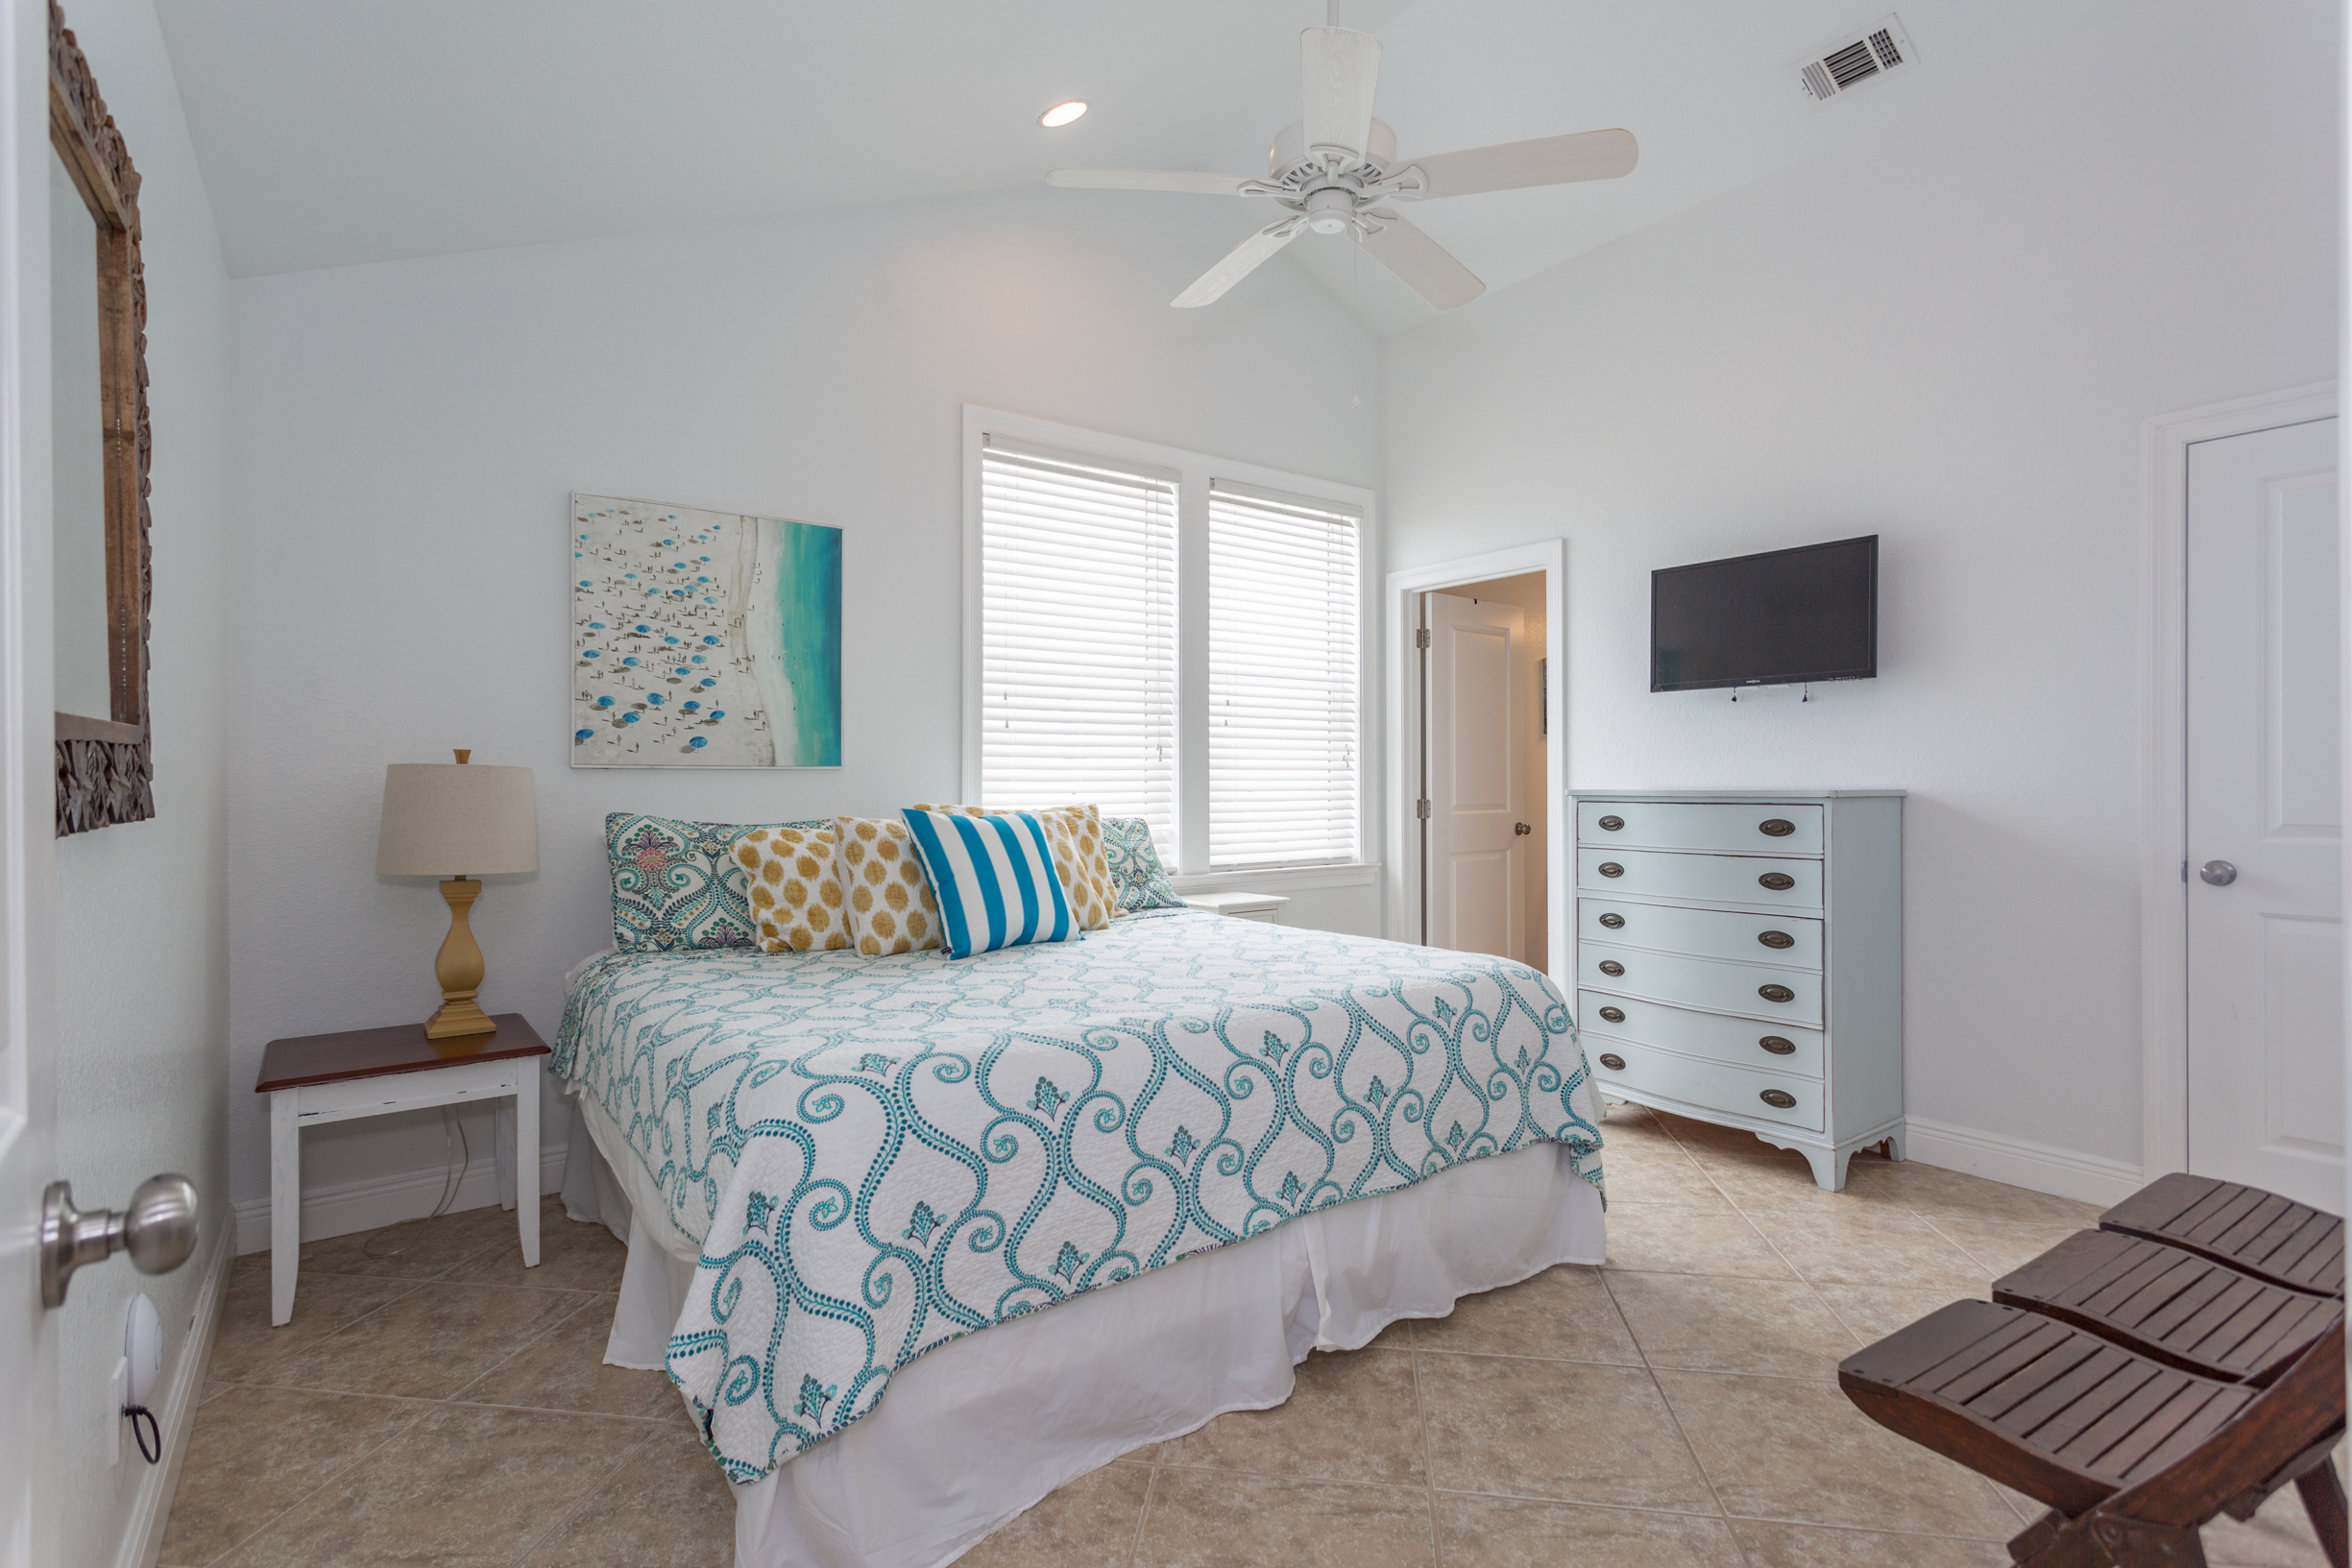 Ariola 1003 - The Starfish House House/Cottage rental in Pensacola Beach House Rentals in Pensacola Beach Florida - #46